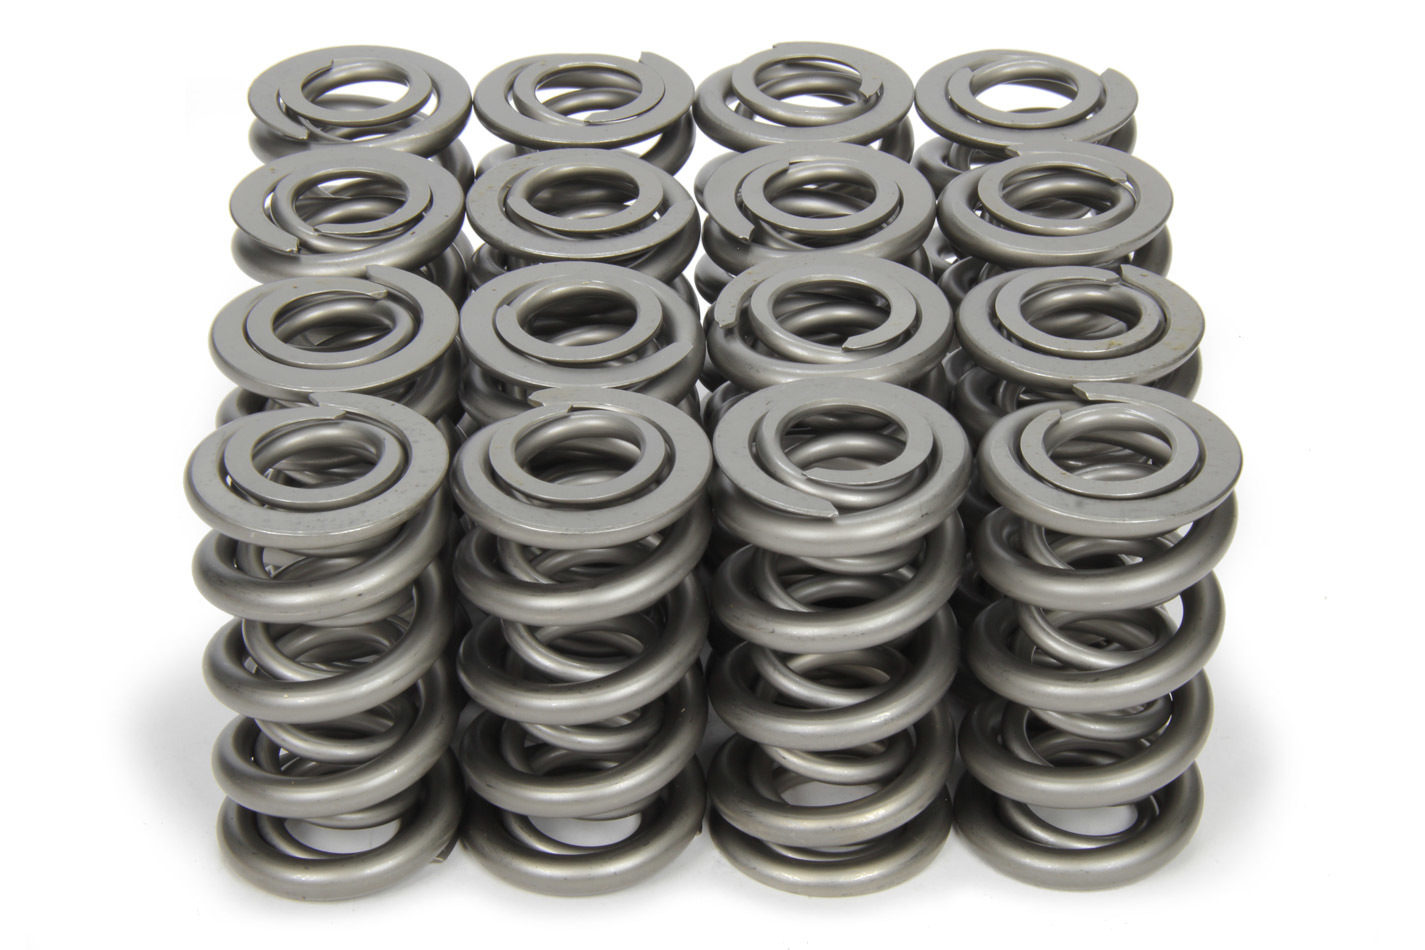 PAC Racing Springs PAC-1354 Valve Spring, 1300 Series, Dual Spring, 1015 lb/in Spring Rate, 1.230 in Coil Bind, 1.550 in OD, Set of 16